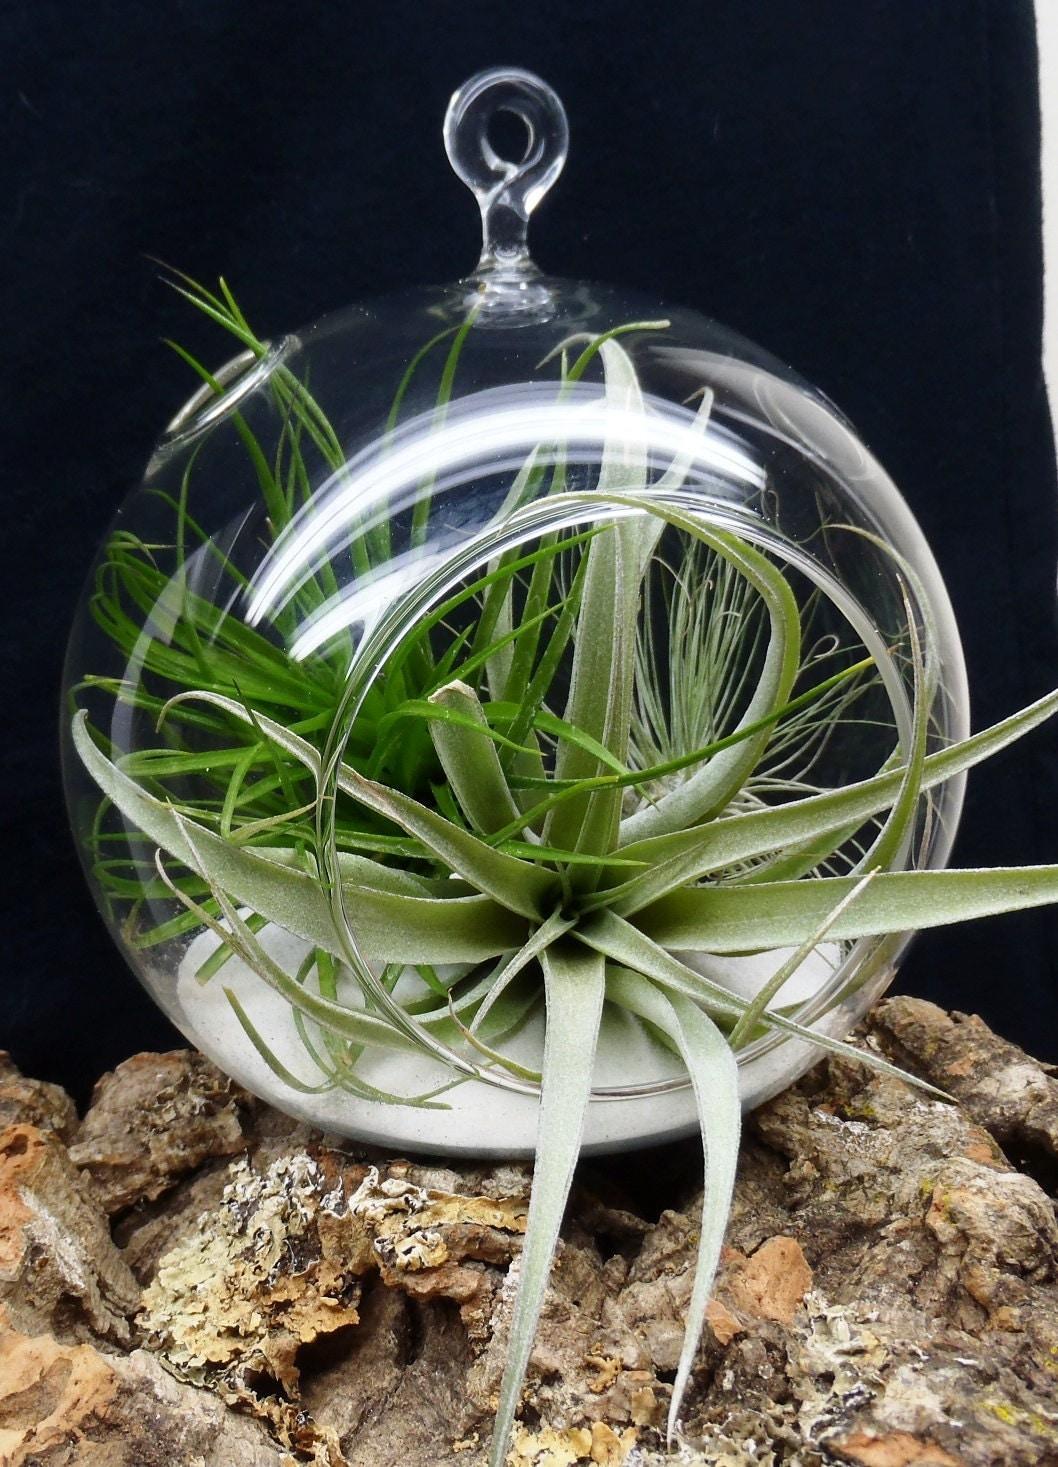 hanging air plant terrarium tillandsias in glass globe. Black Bedroom Furniture Sets. Home Design Ideas